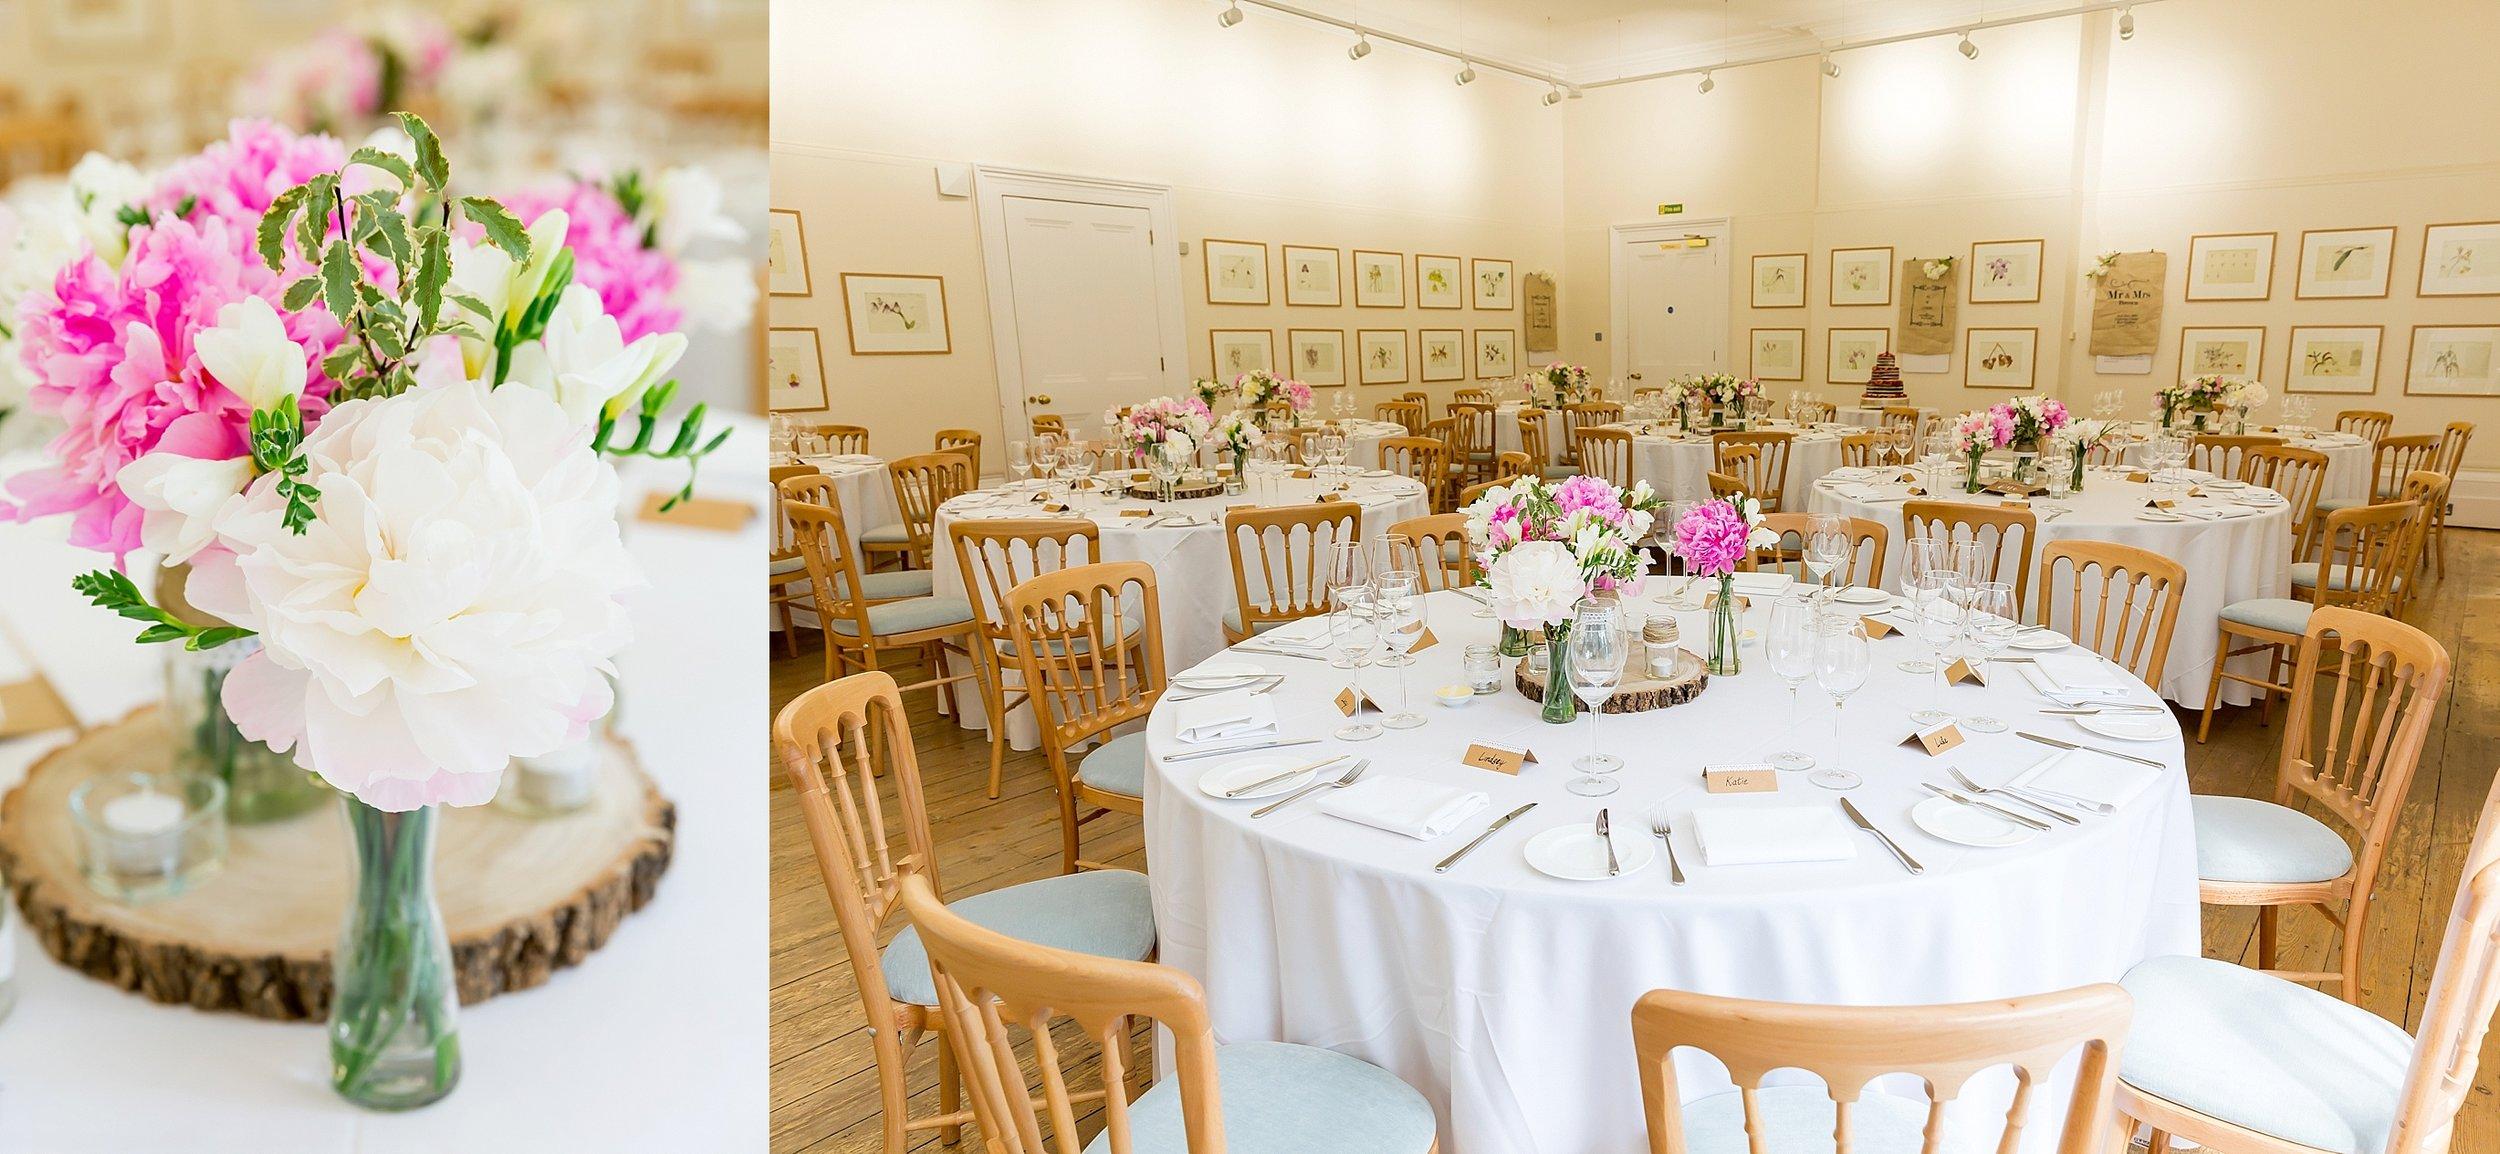 wedding reception at cambridge cottage.jpg